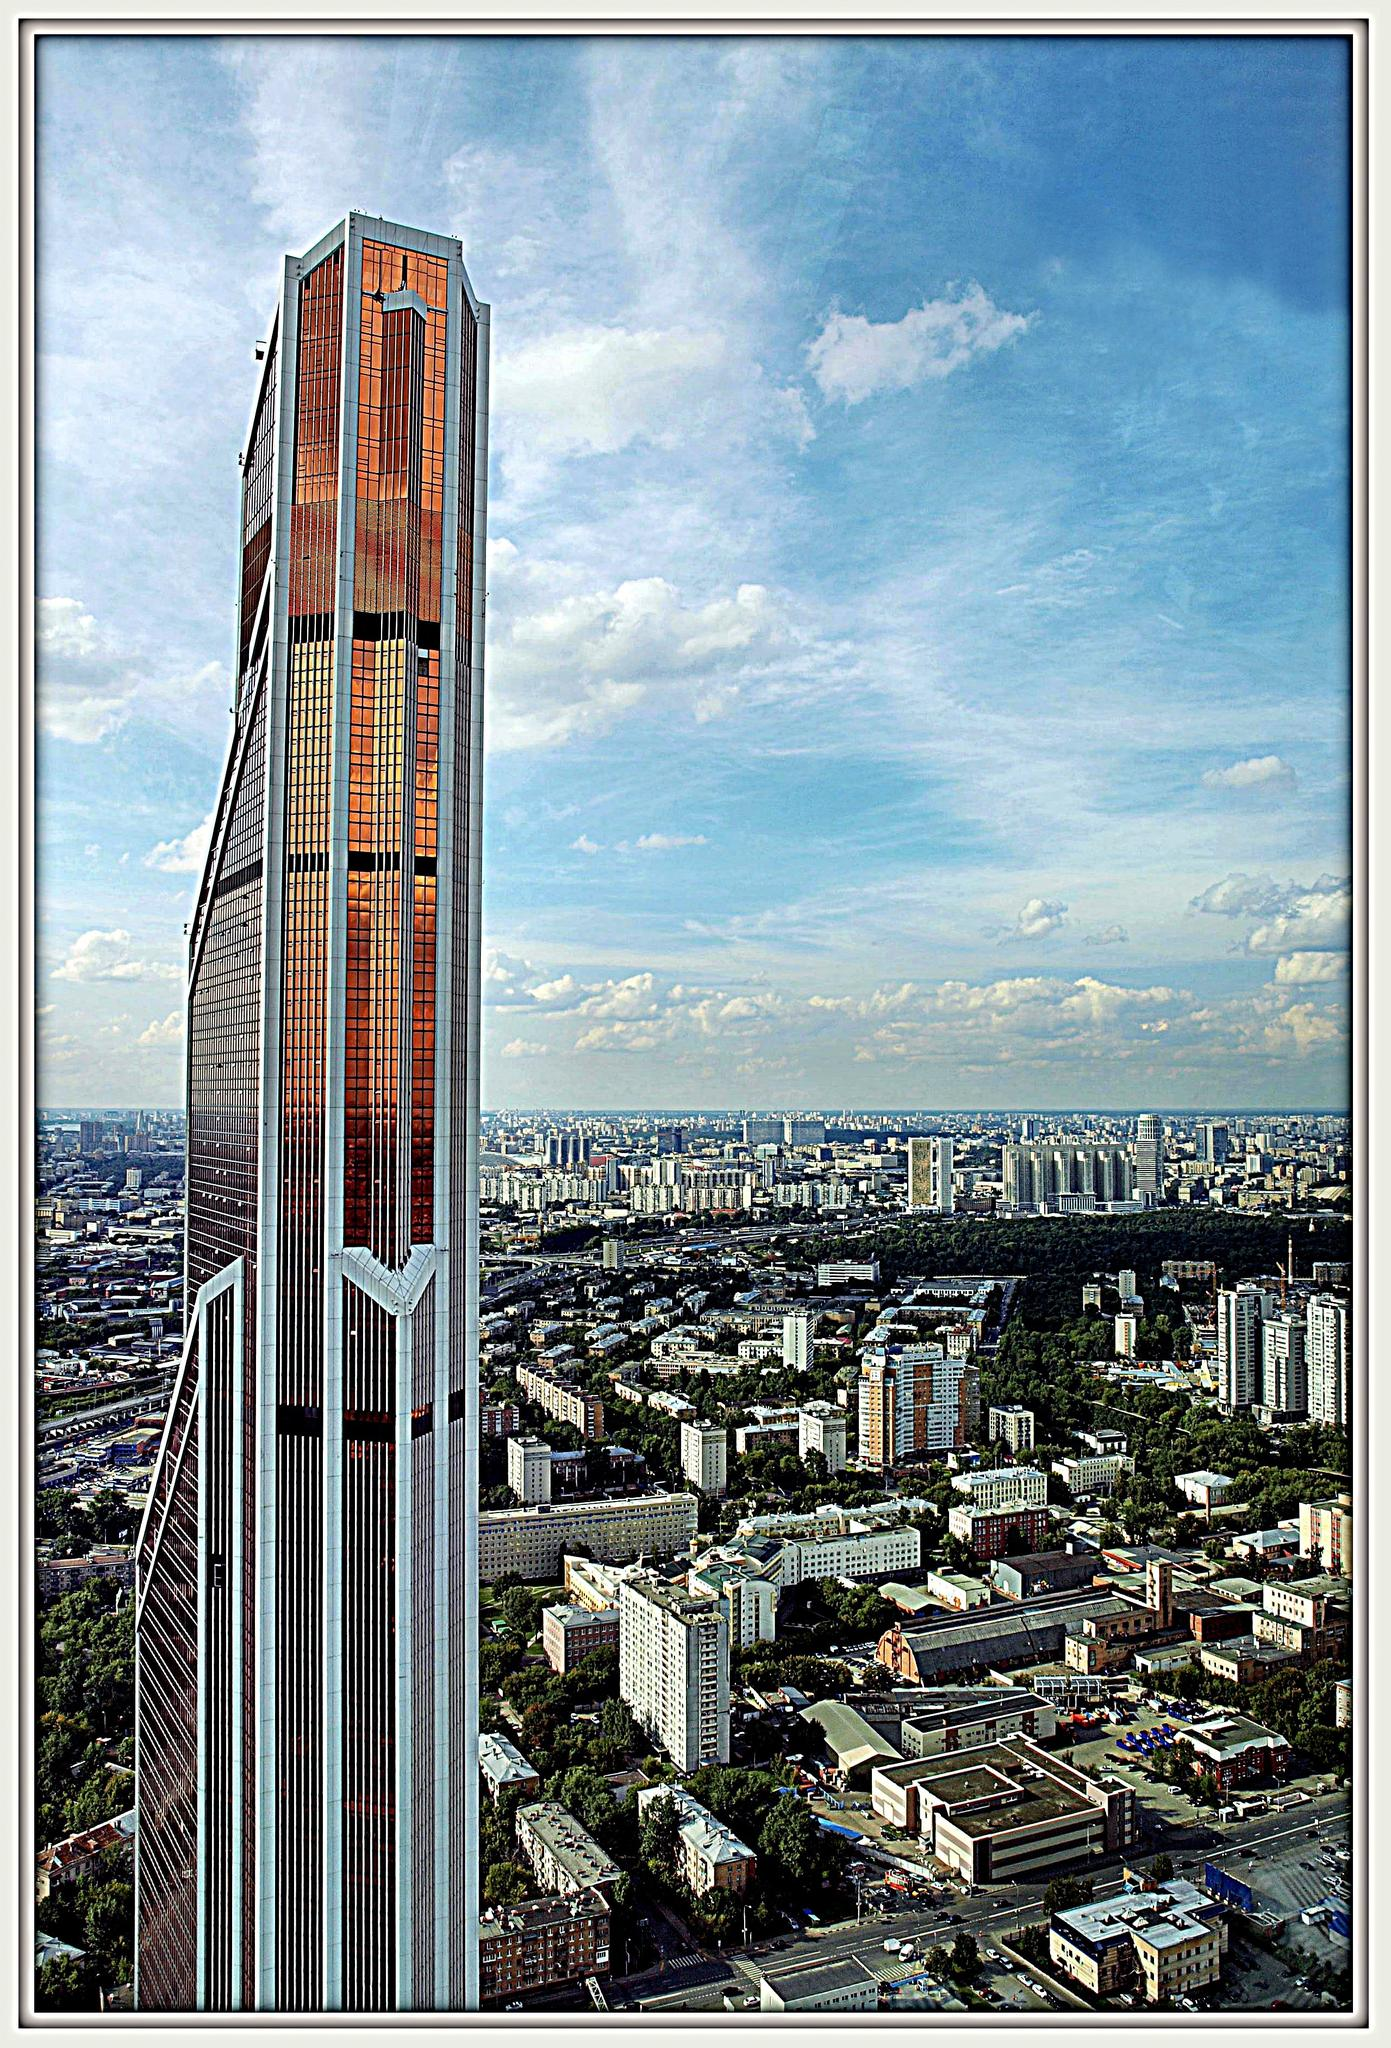 Башня Меркурий Сити. Фотография Малец Михаила Георгиевича